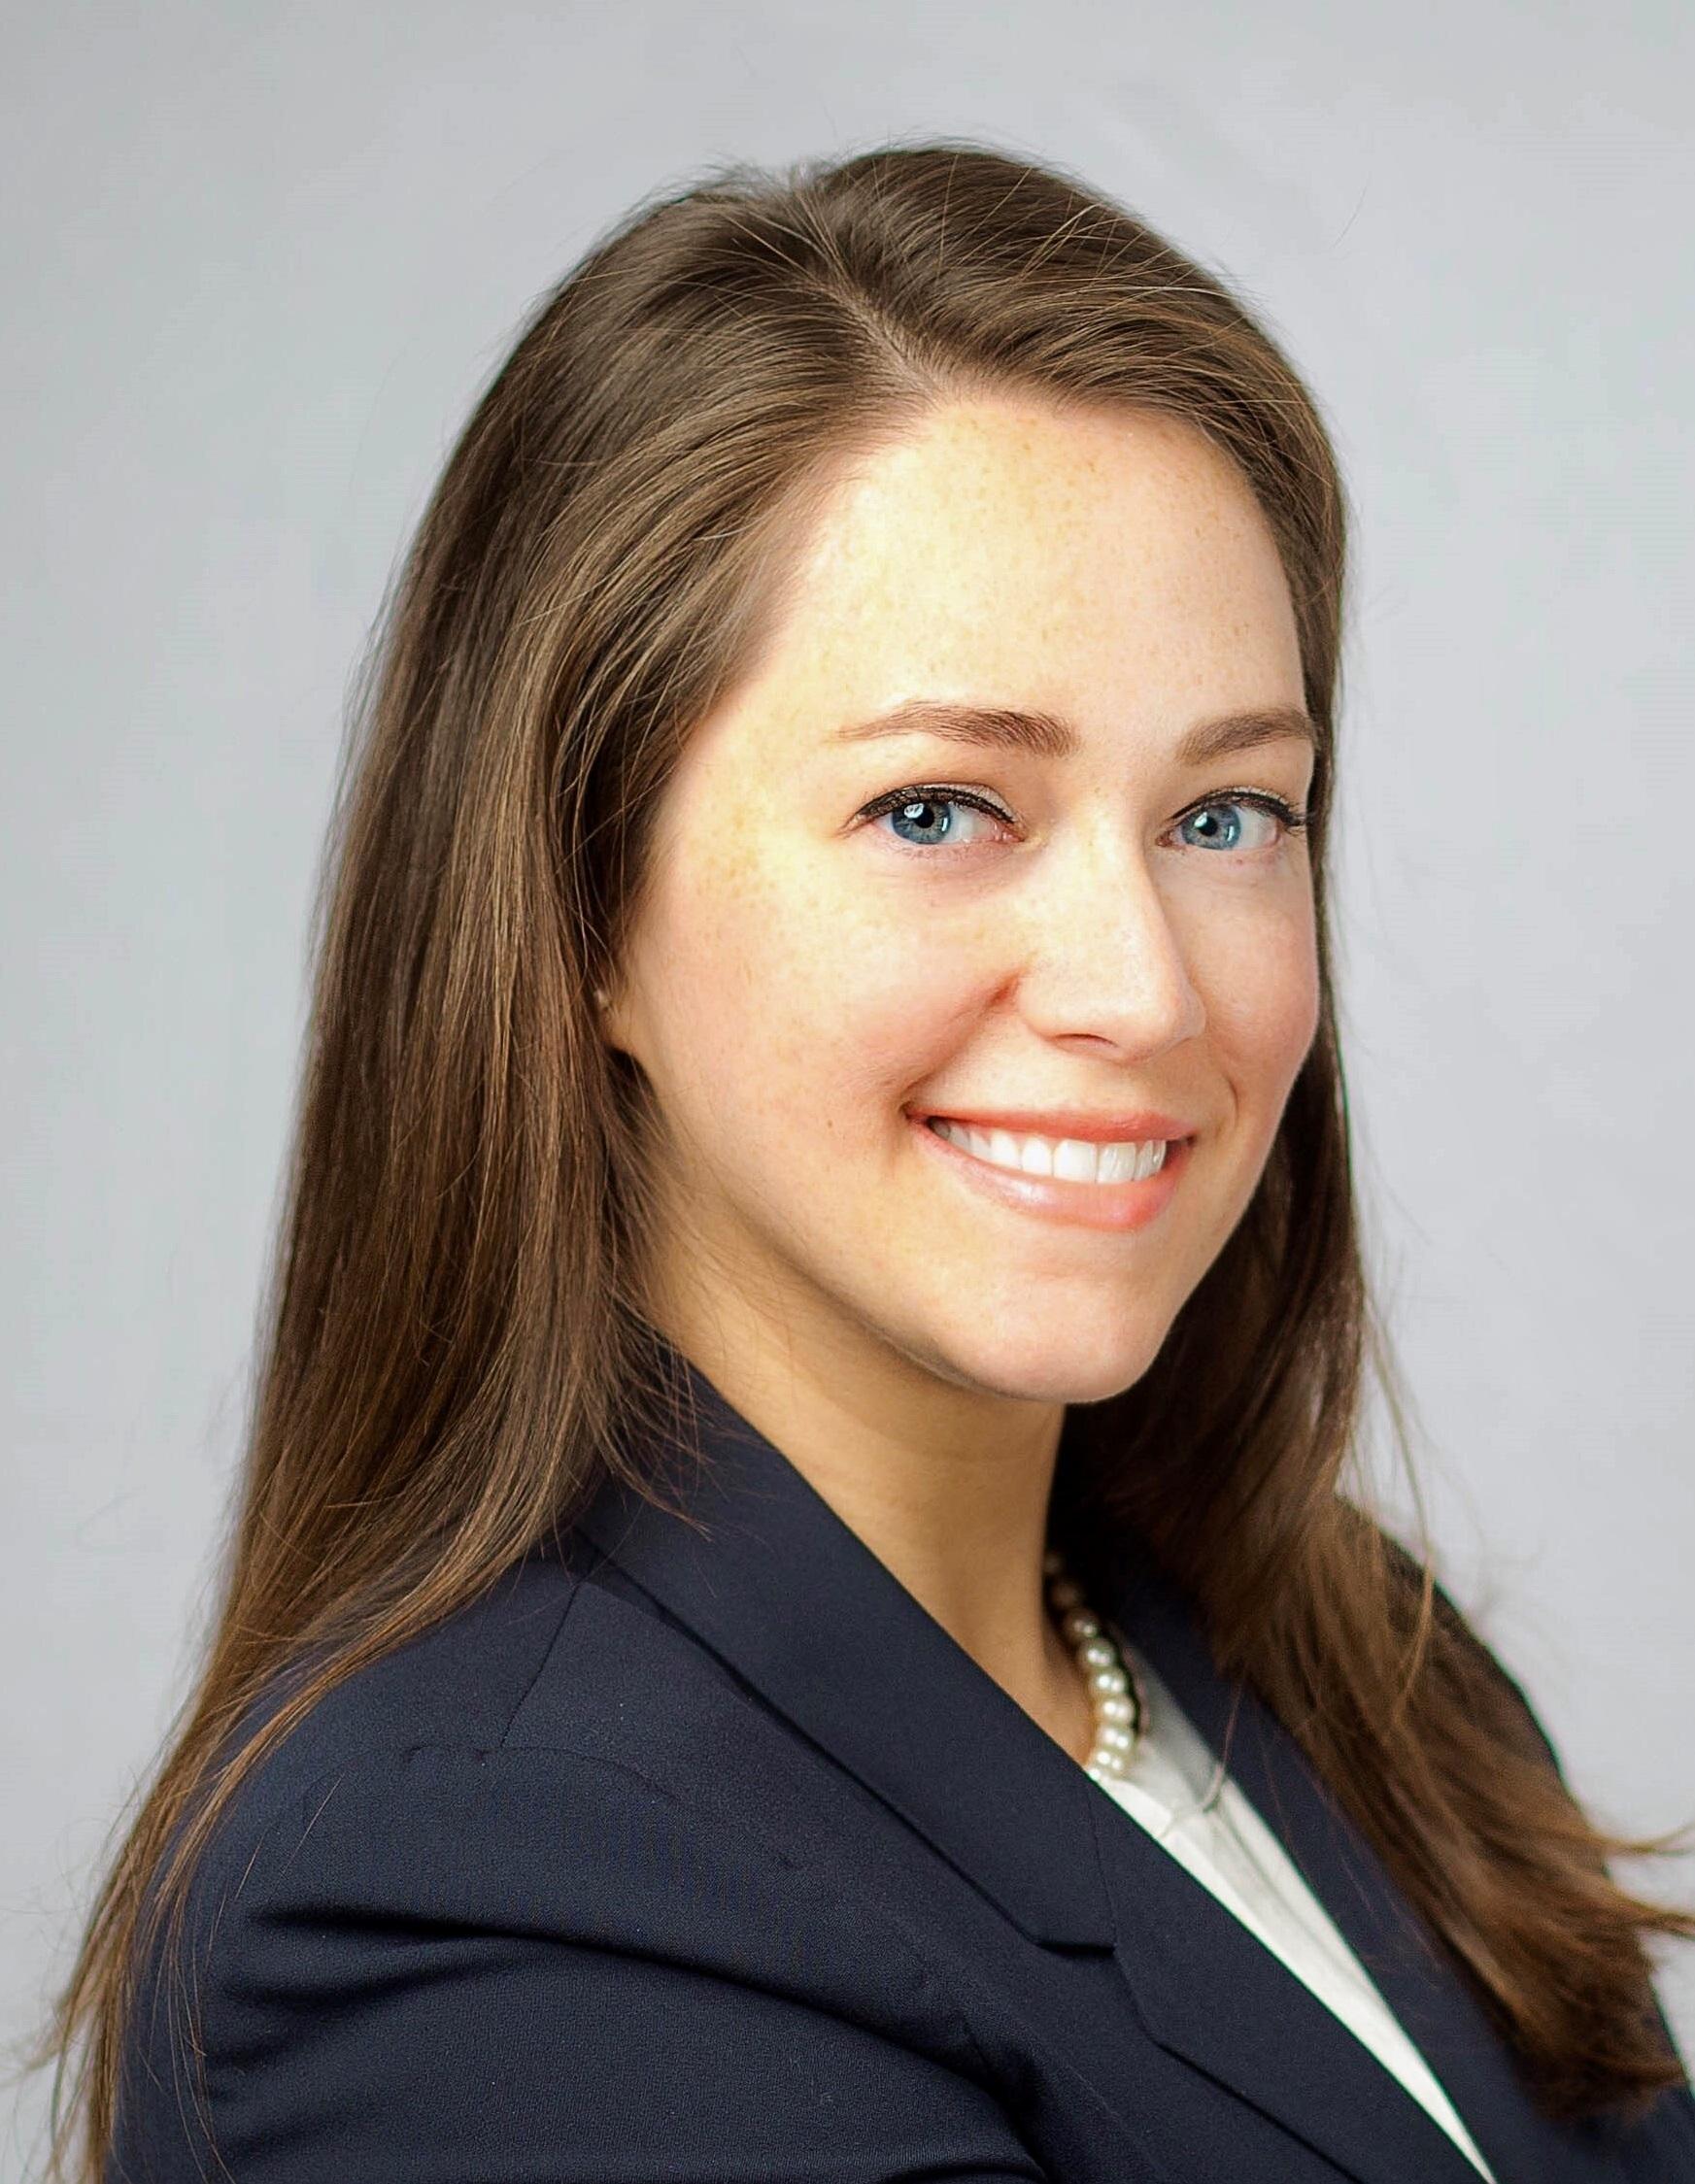 Jenna Jankowski